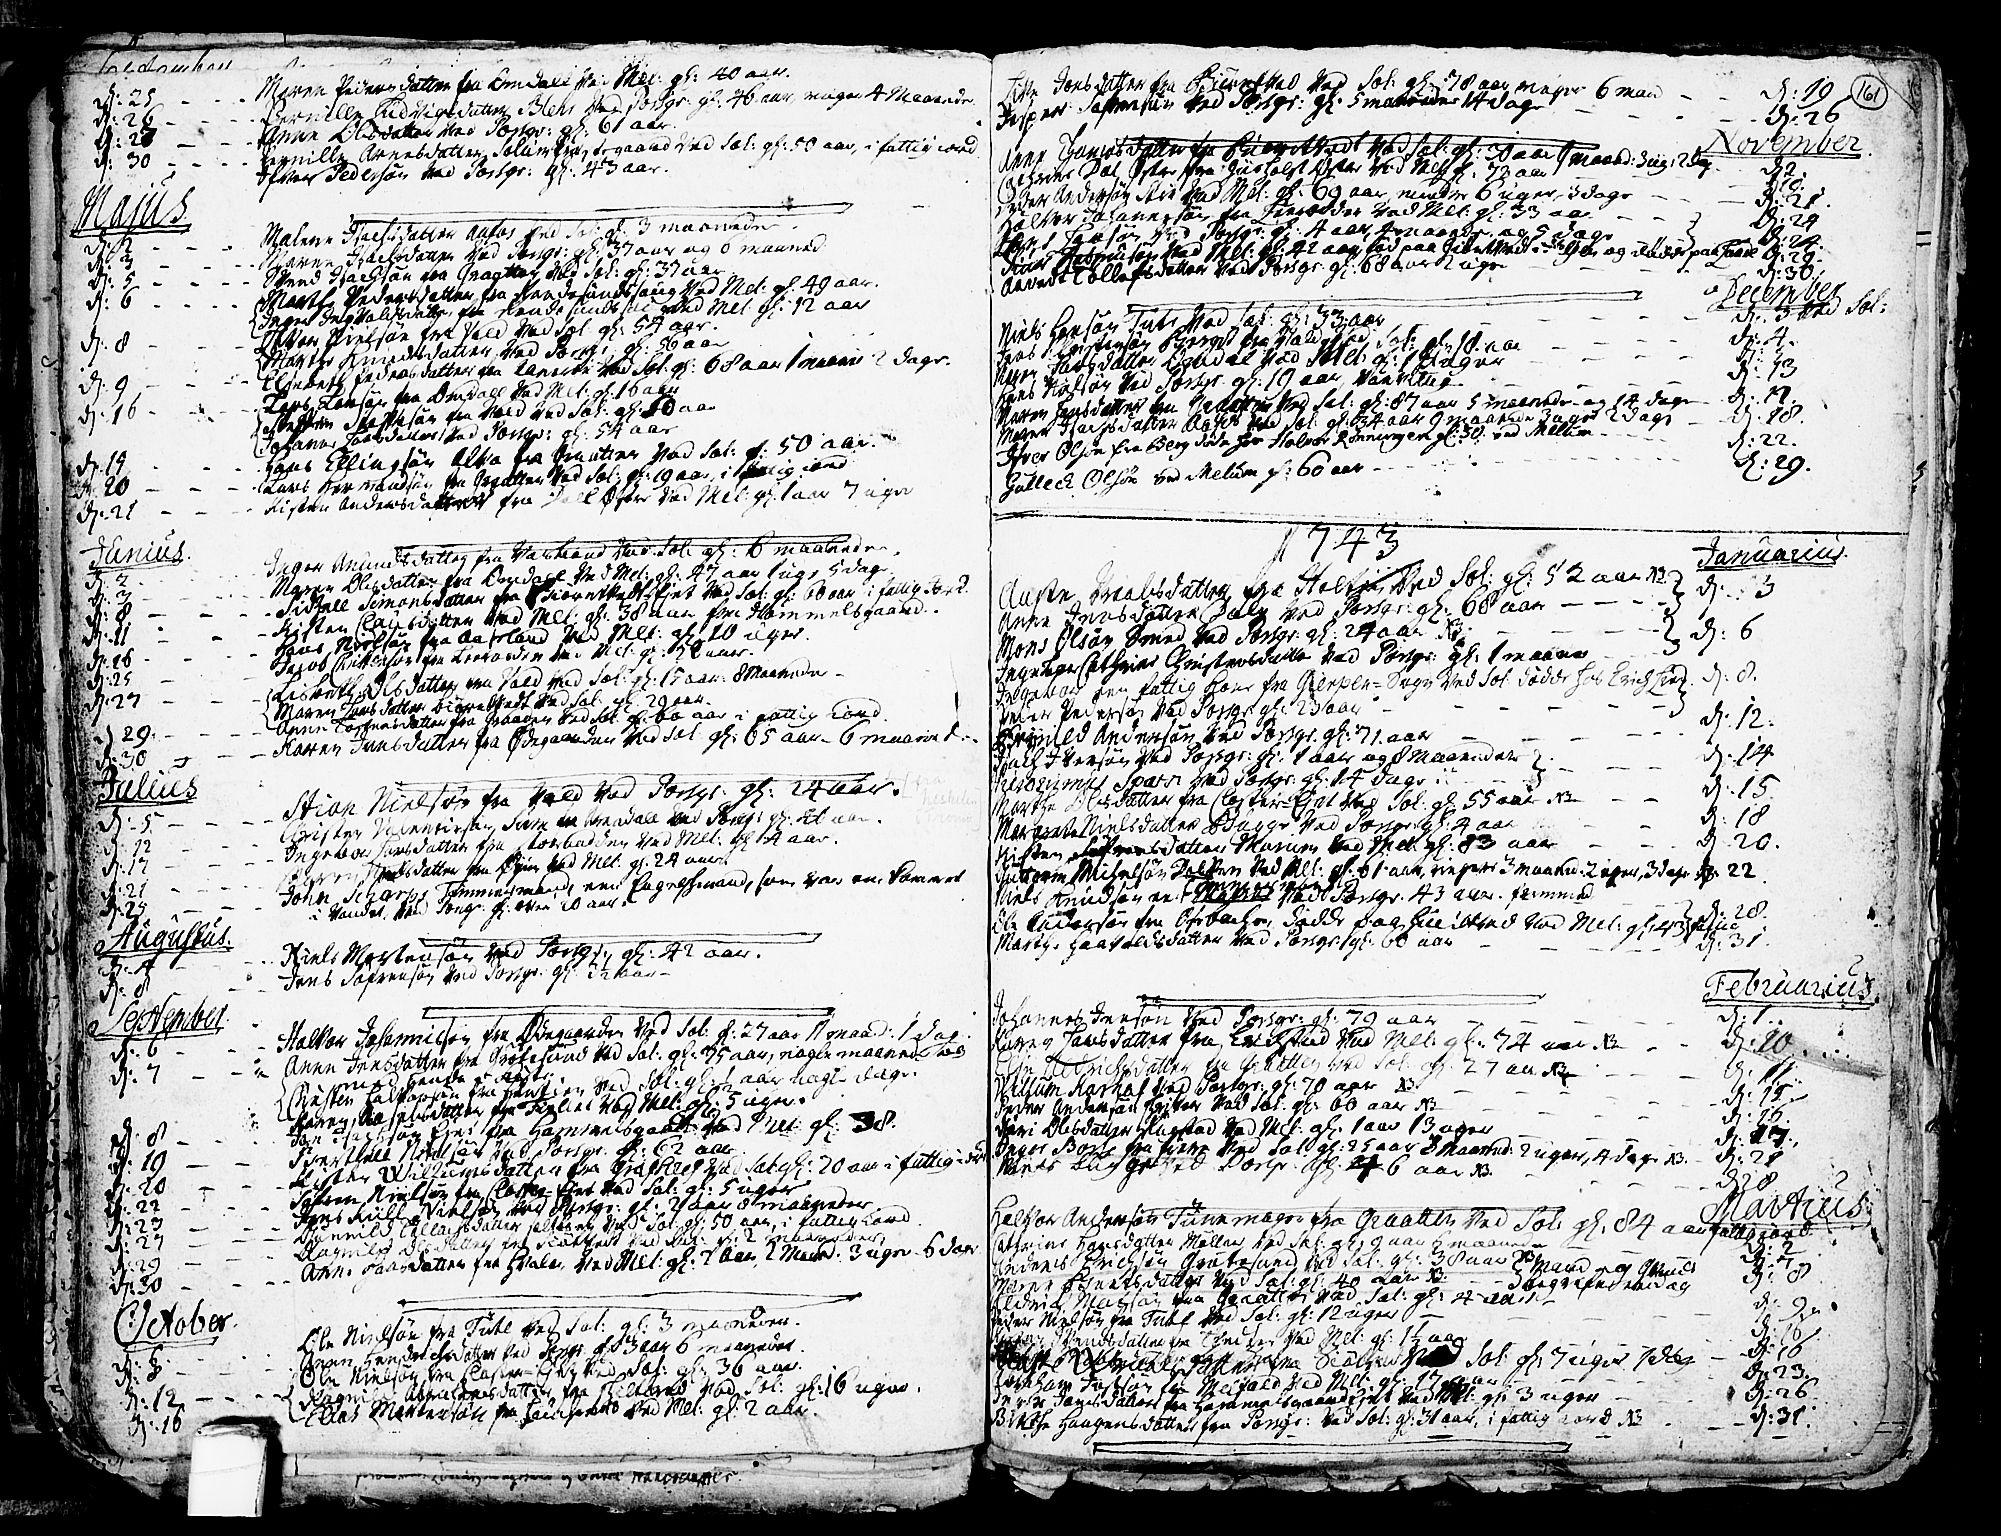 SAKO, Solum kirkebøker, F/Fa/L0002: Ministerialbok nr. I 2, 1713-1761, s. 161